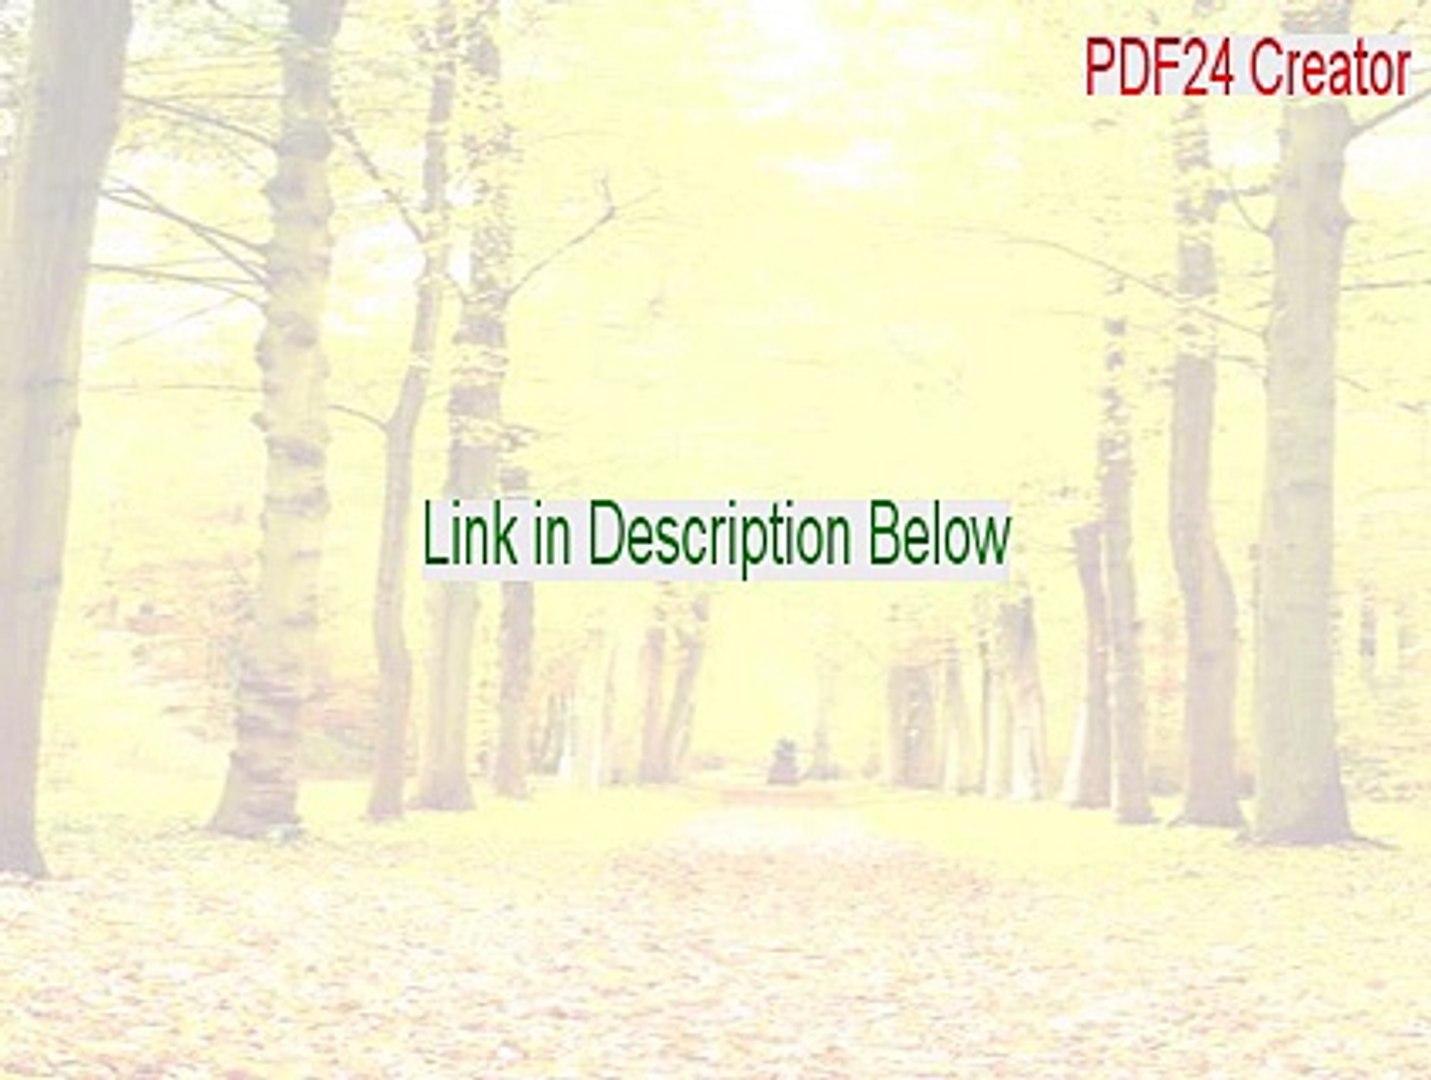 PDF24 Creator Full - pdf24 creator portable (2015)